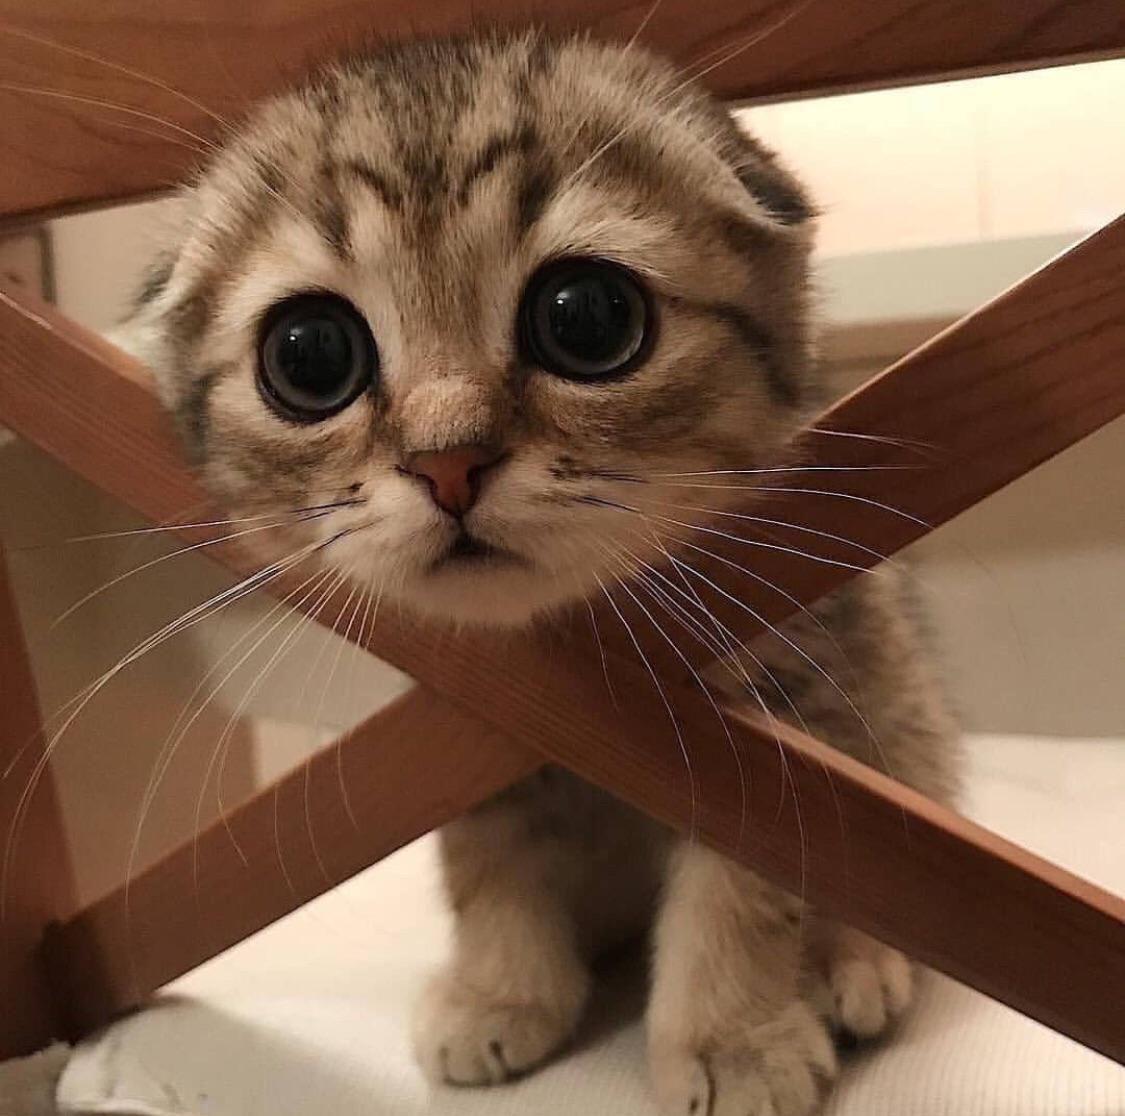 Free The Poor Fellahttps I Redd It Qs78t1pydkb31 Jpg Cute Cat Gif Cute Cats Cute Animals